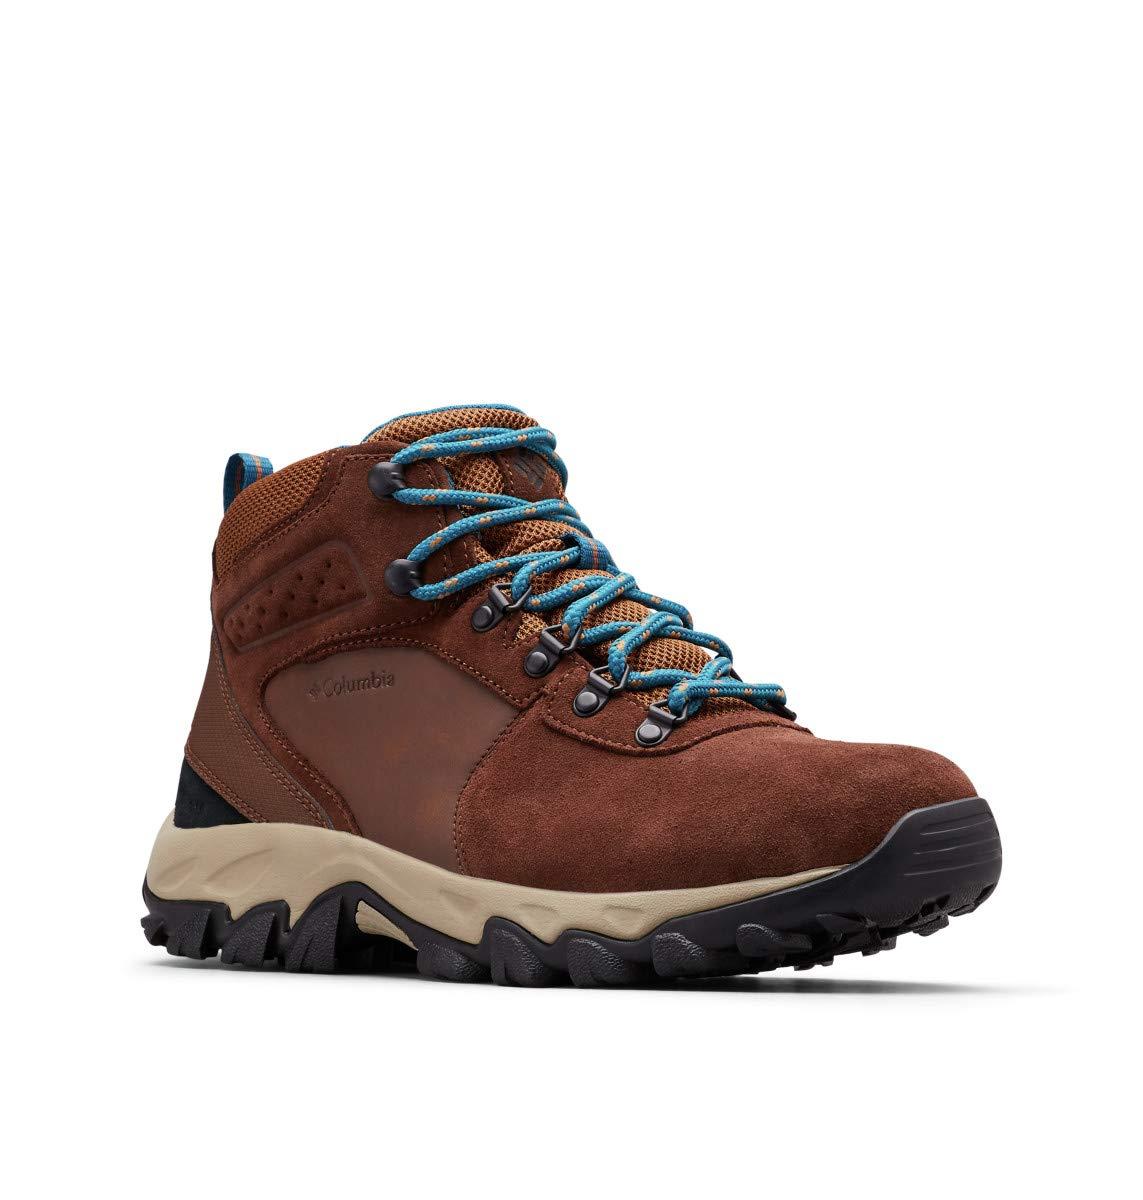 Columbia Men's Newton Ridge Plus II Suede Waterproof Hiking Shoe, Tobacco, Lagoon, 12 Wide US by Columbia